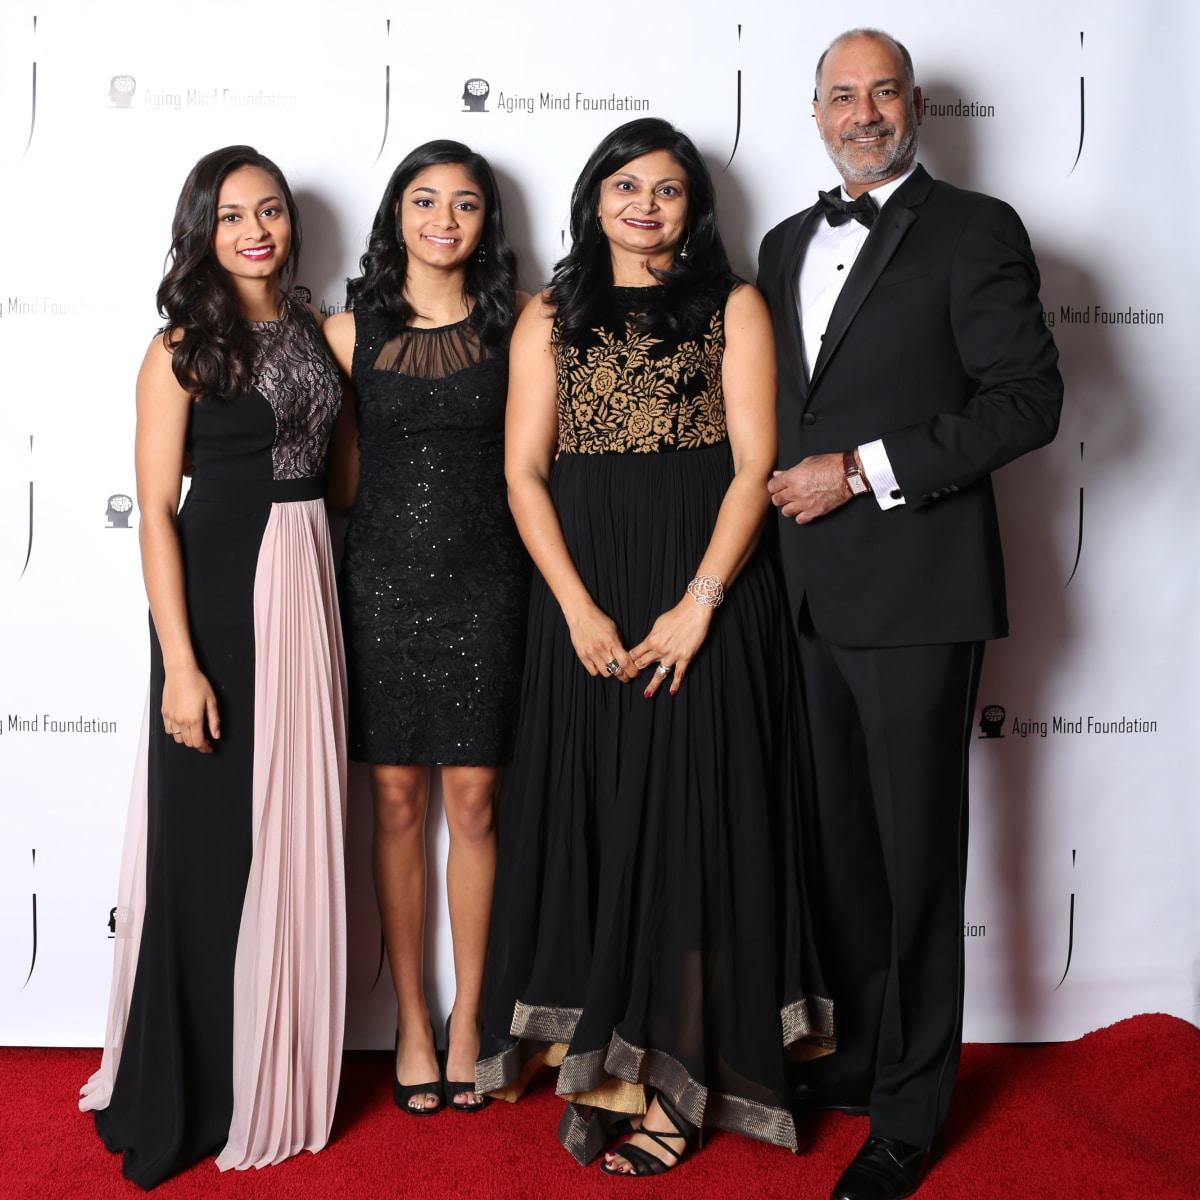 Pooja Singh, Radhika Singh, Kitty Singh, Alex Singh